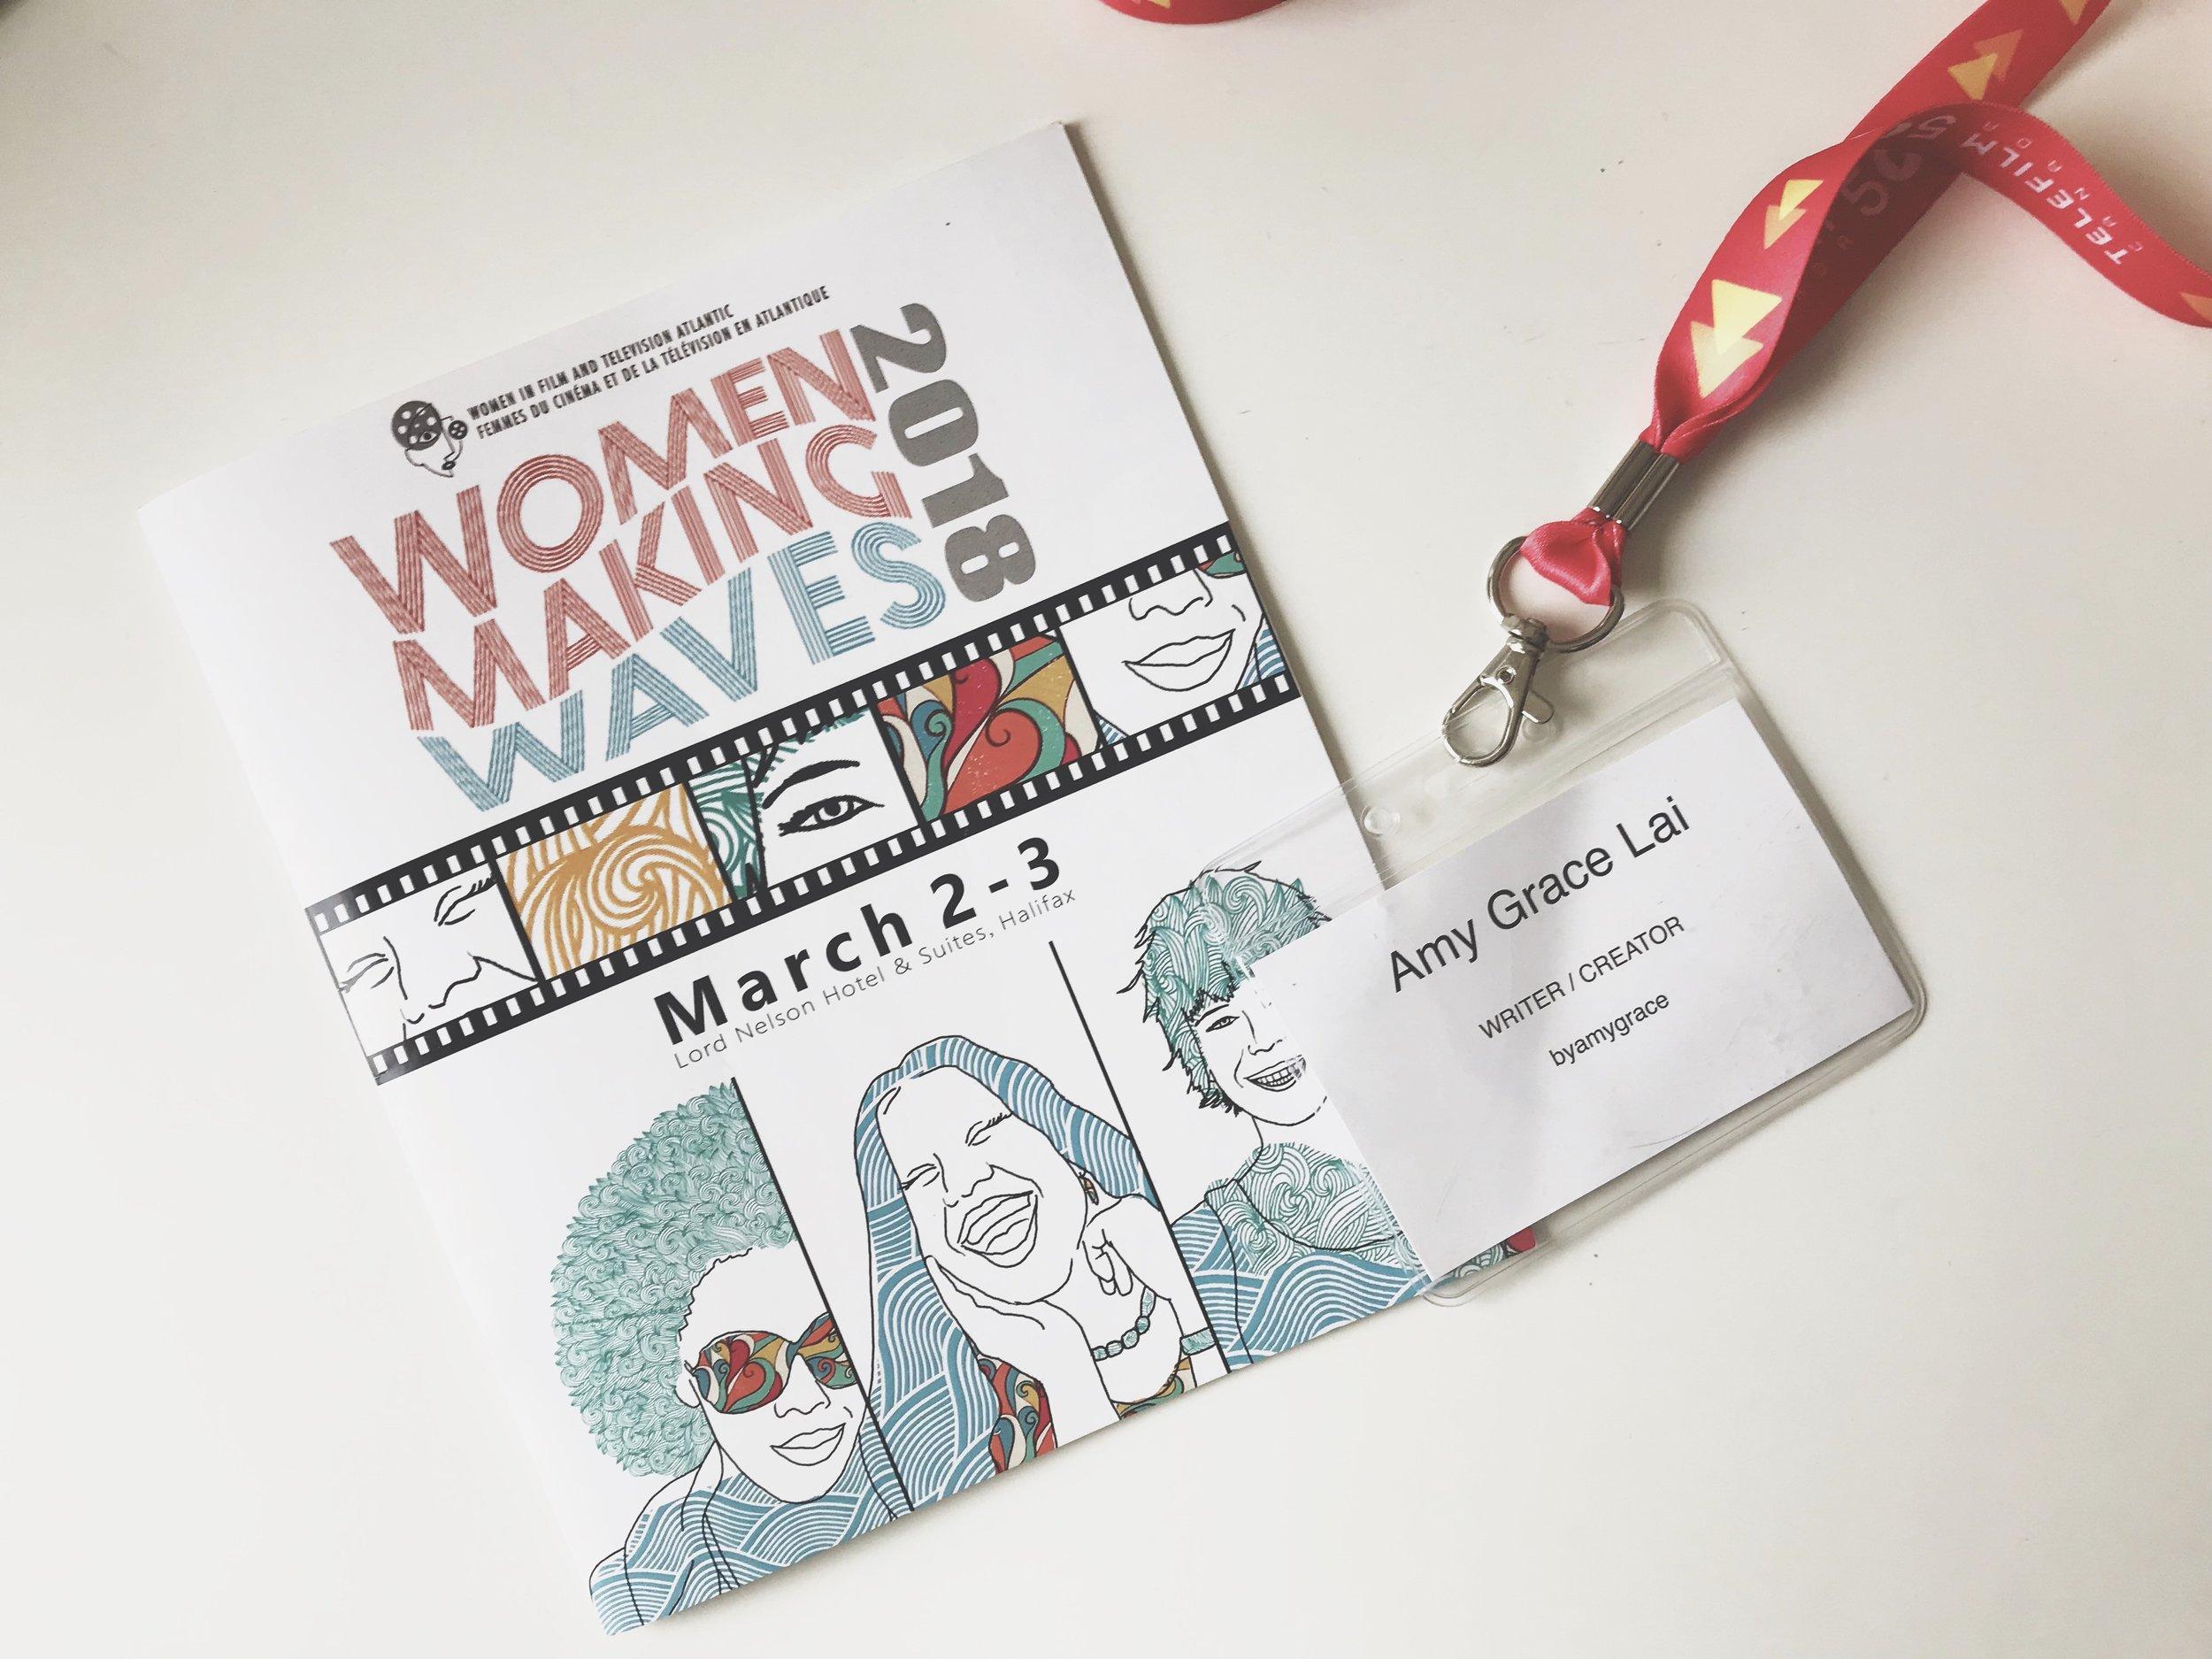 womenmakingwaves.2018.byamygrace